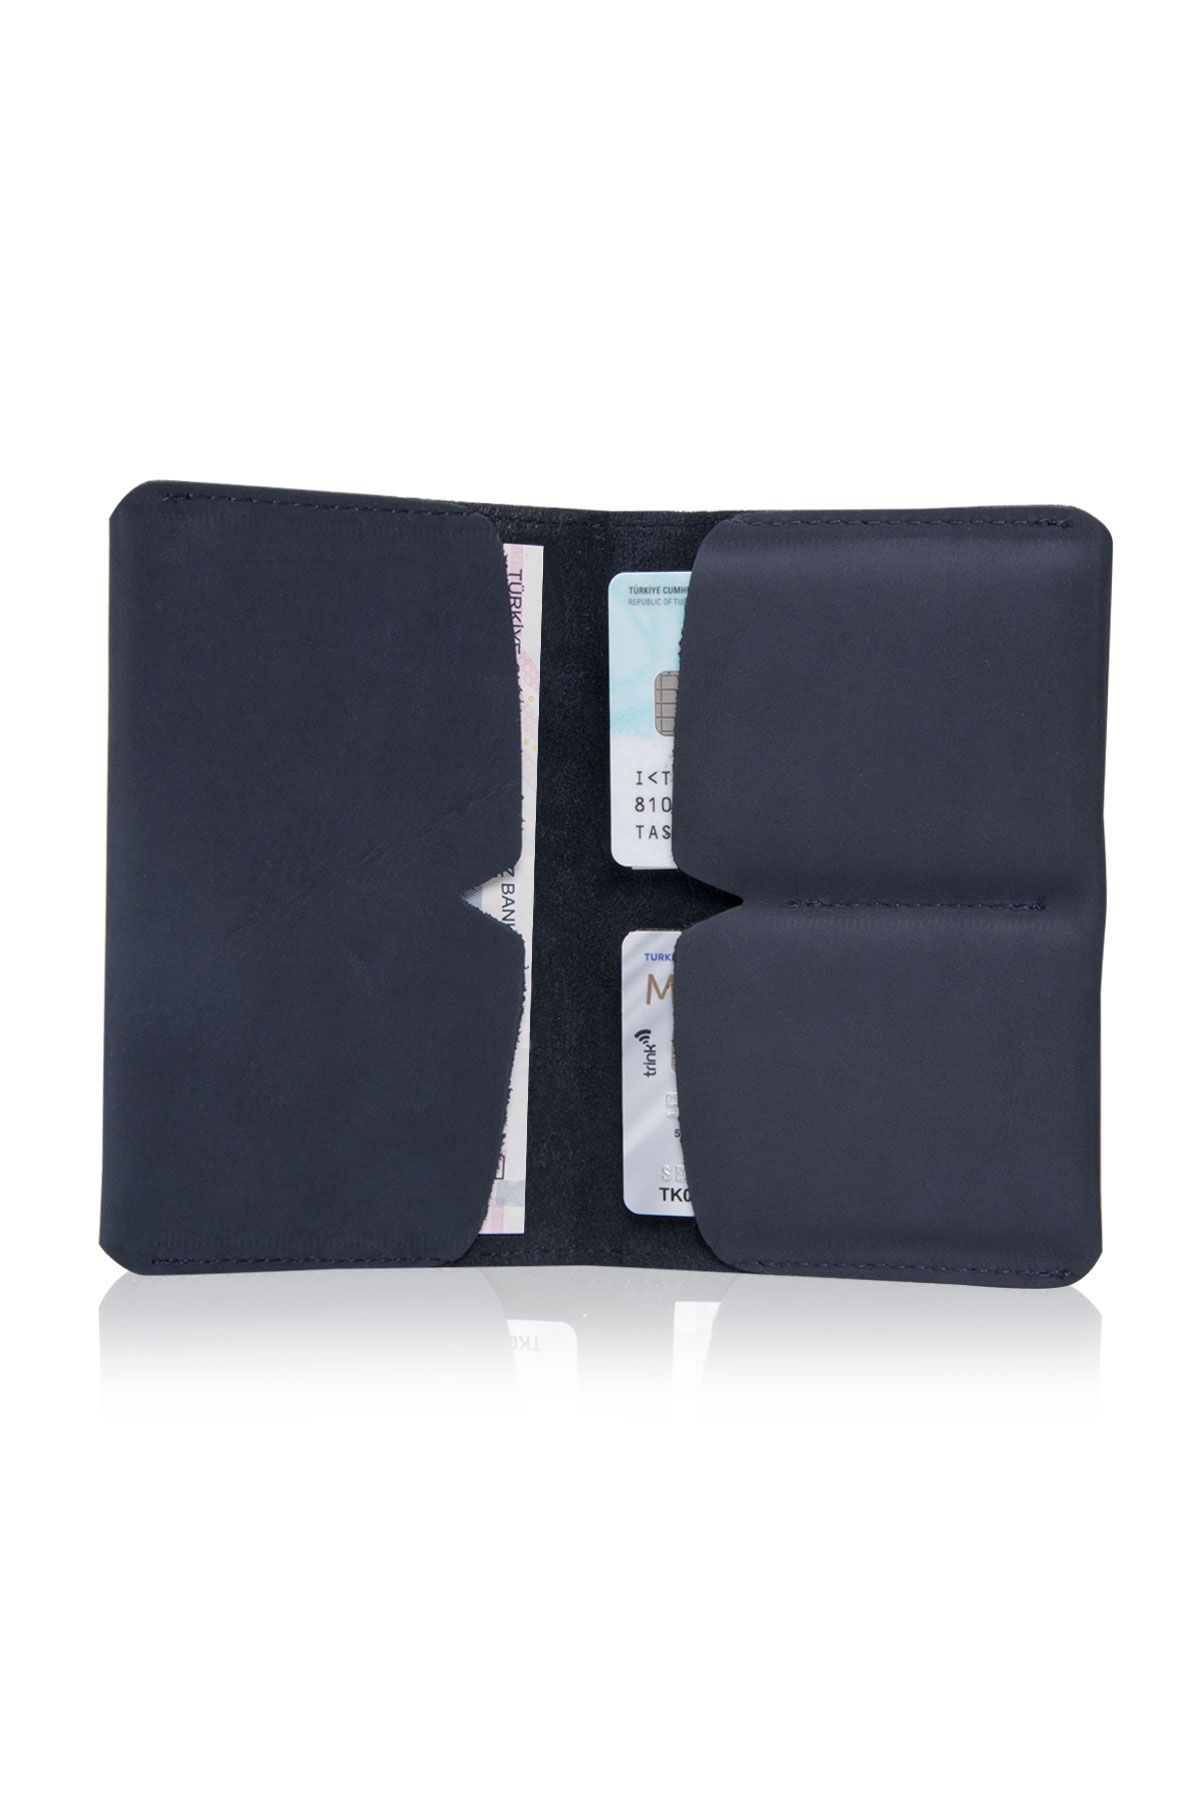 Pegia Genuine Nubuck Big Size Wallet 19CZ306 Navy blue